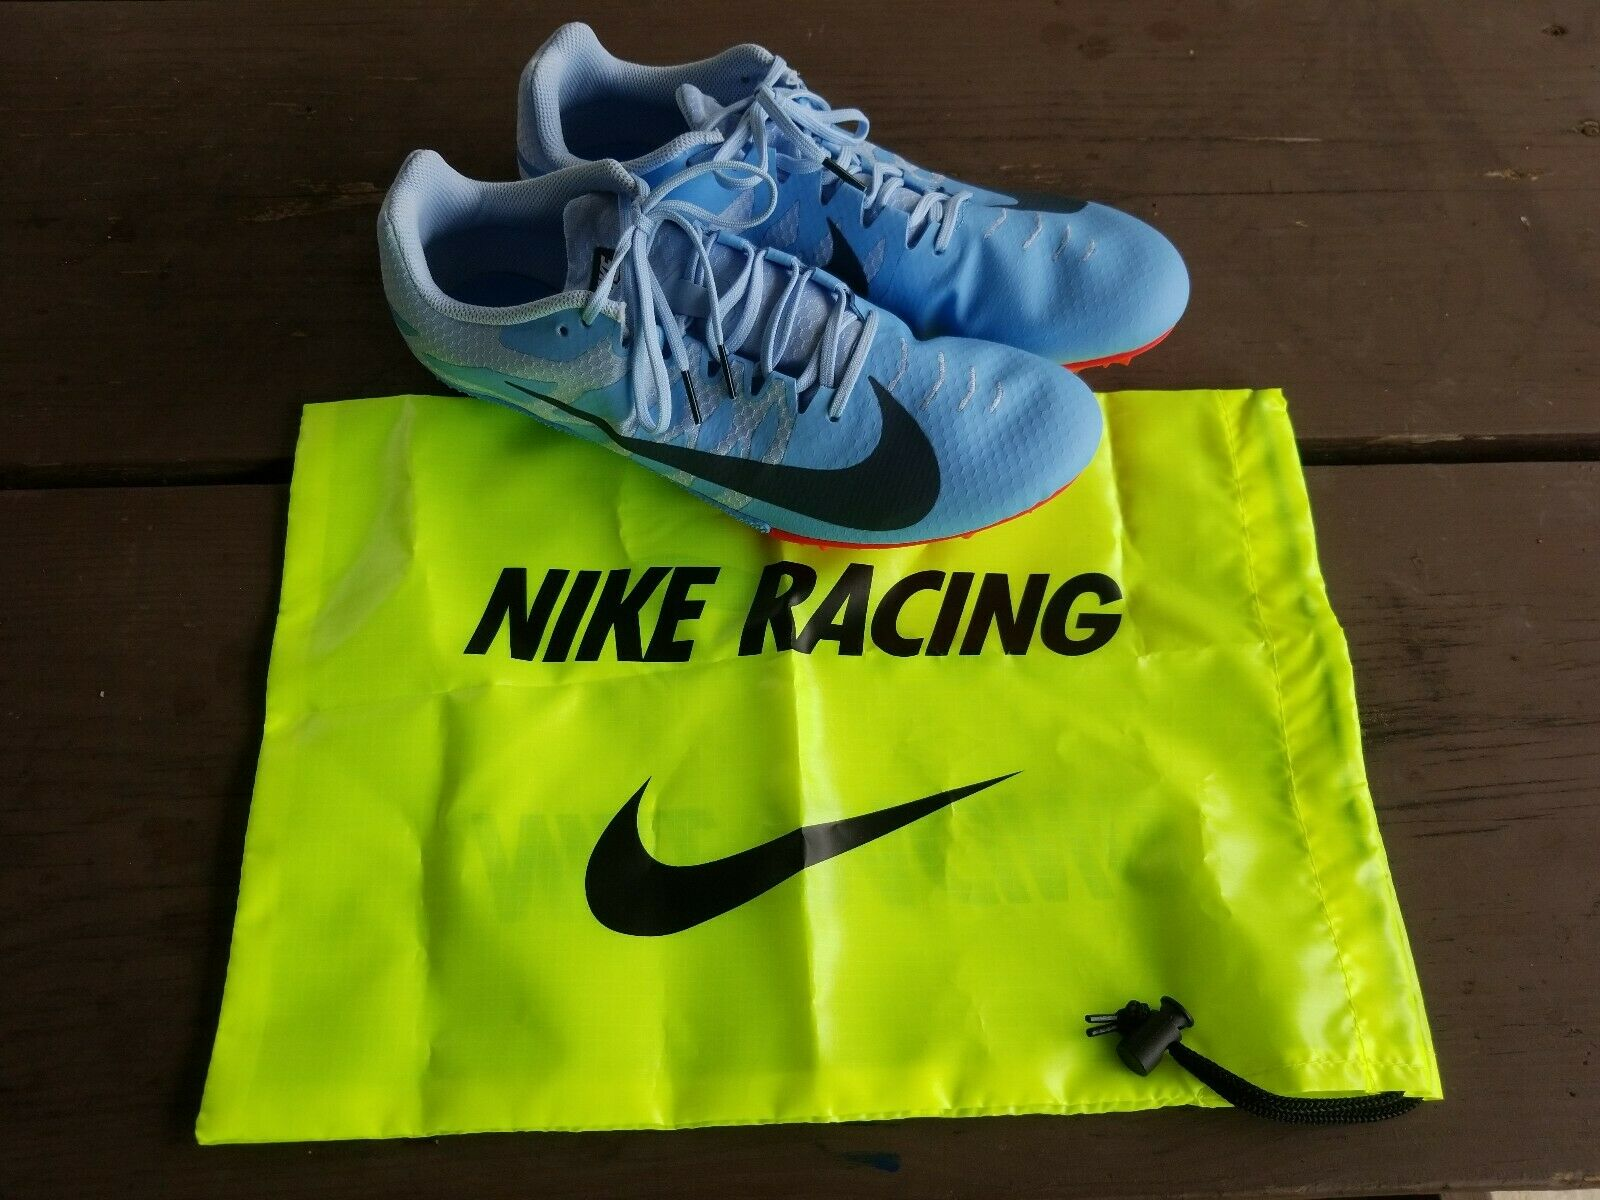 nike racing cleats